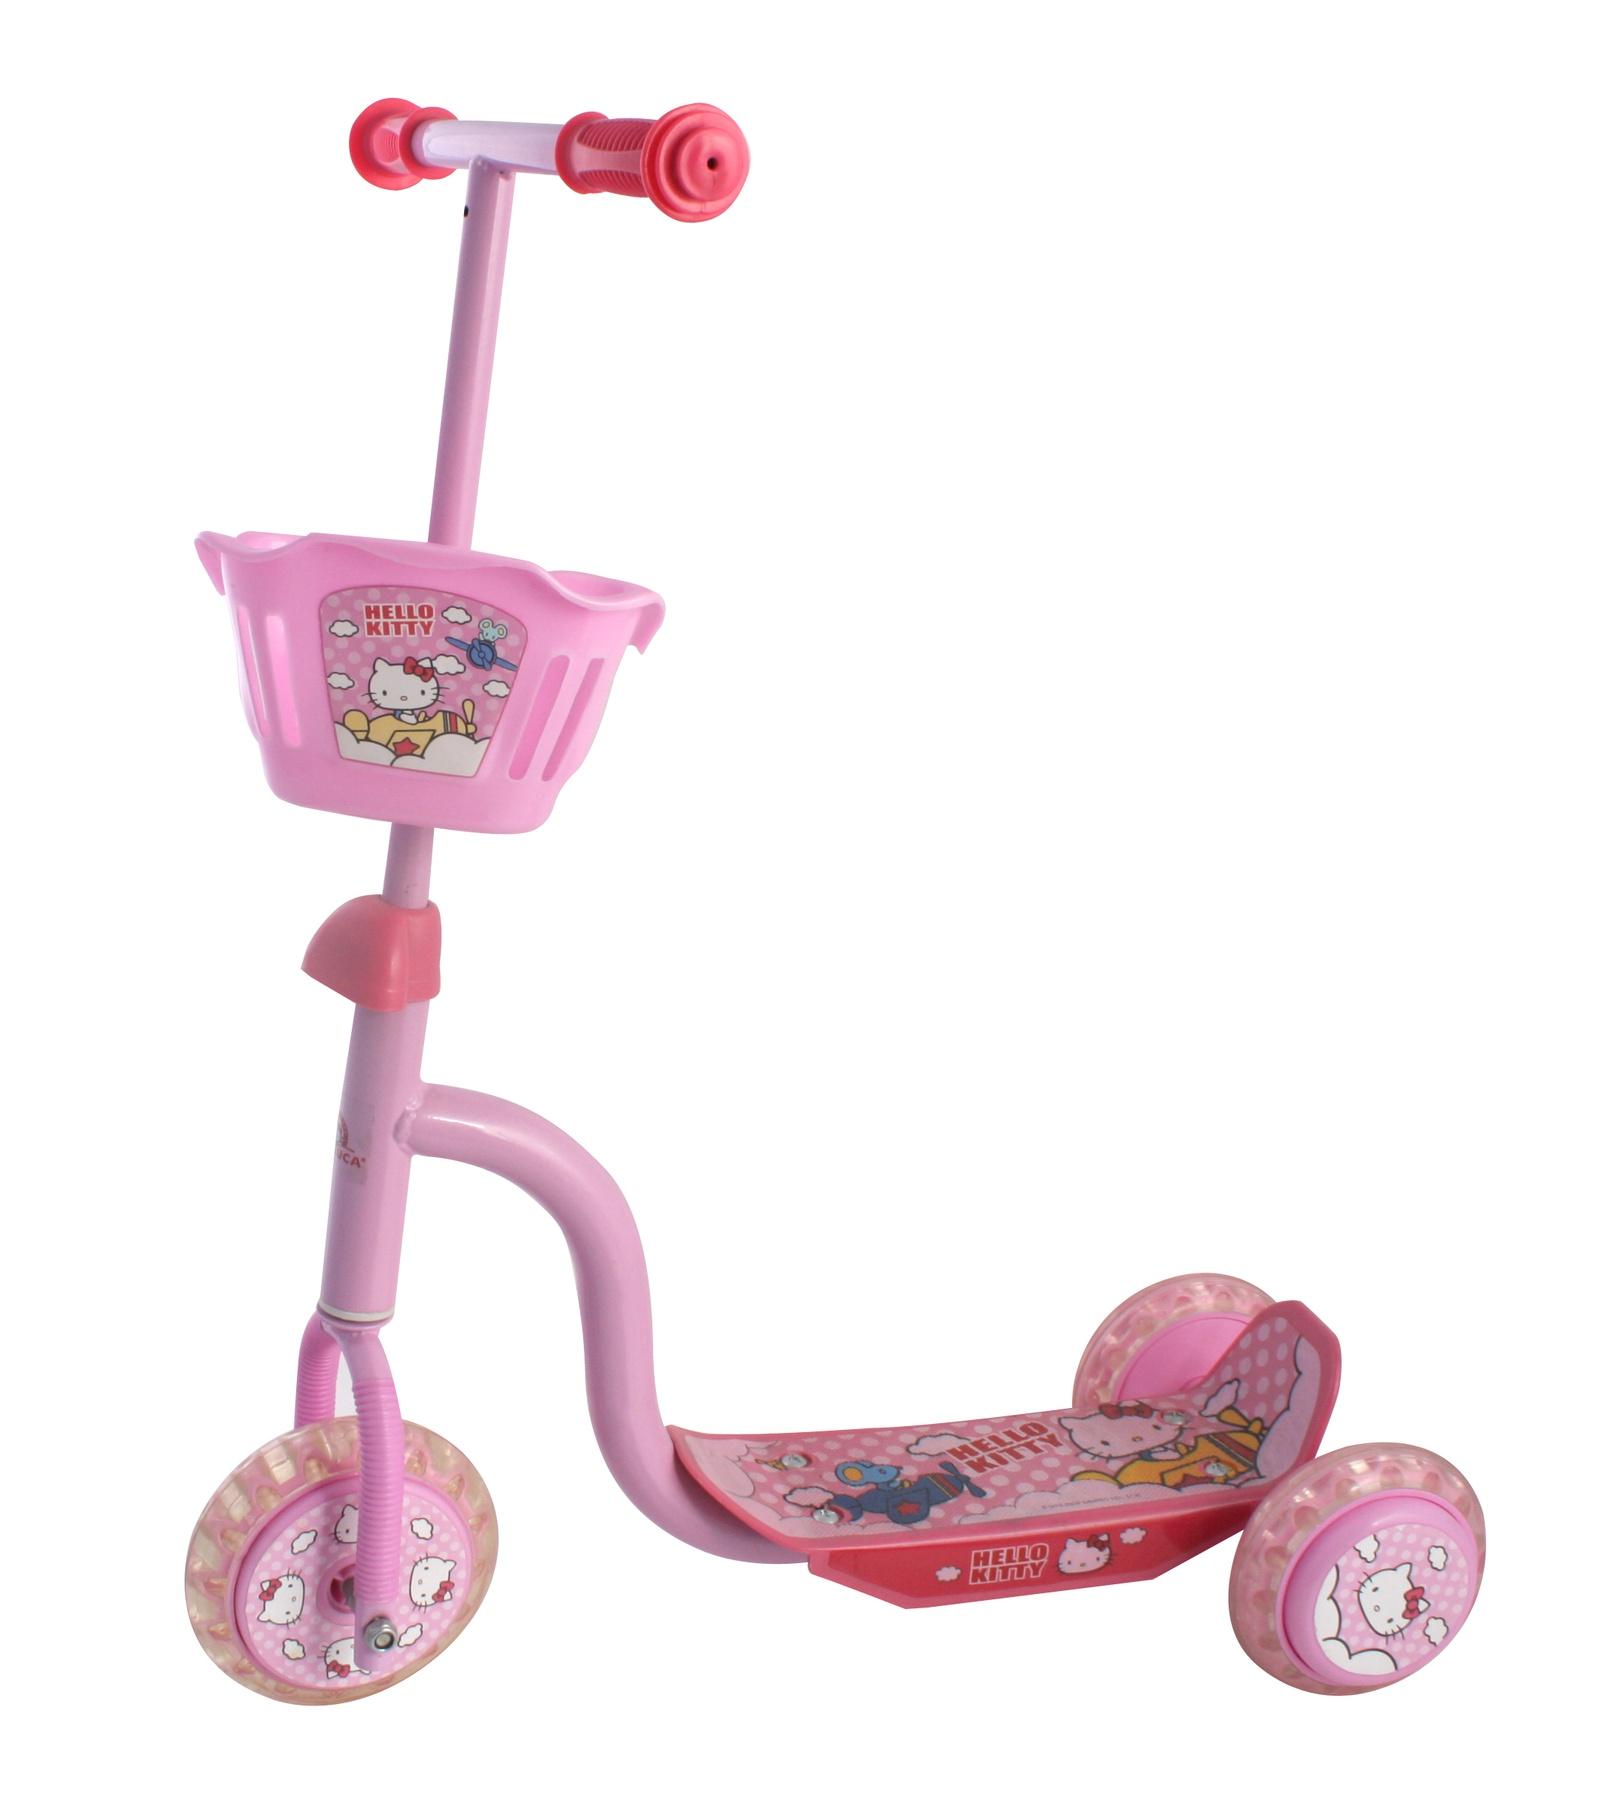 Самокат Hello Kitty детский HC1003-KC, розовый детский поильник hello kitty ktxg01 hellokitty